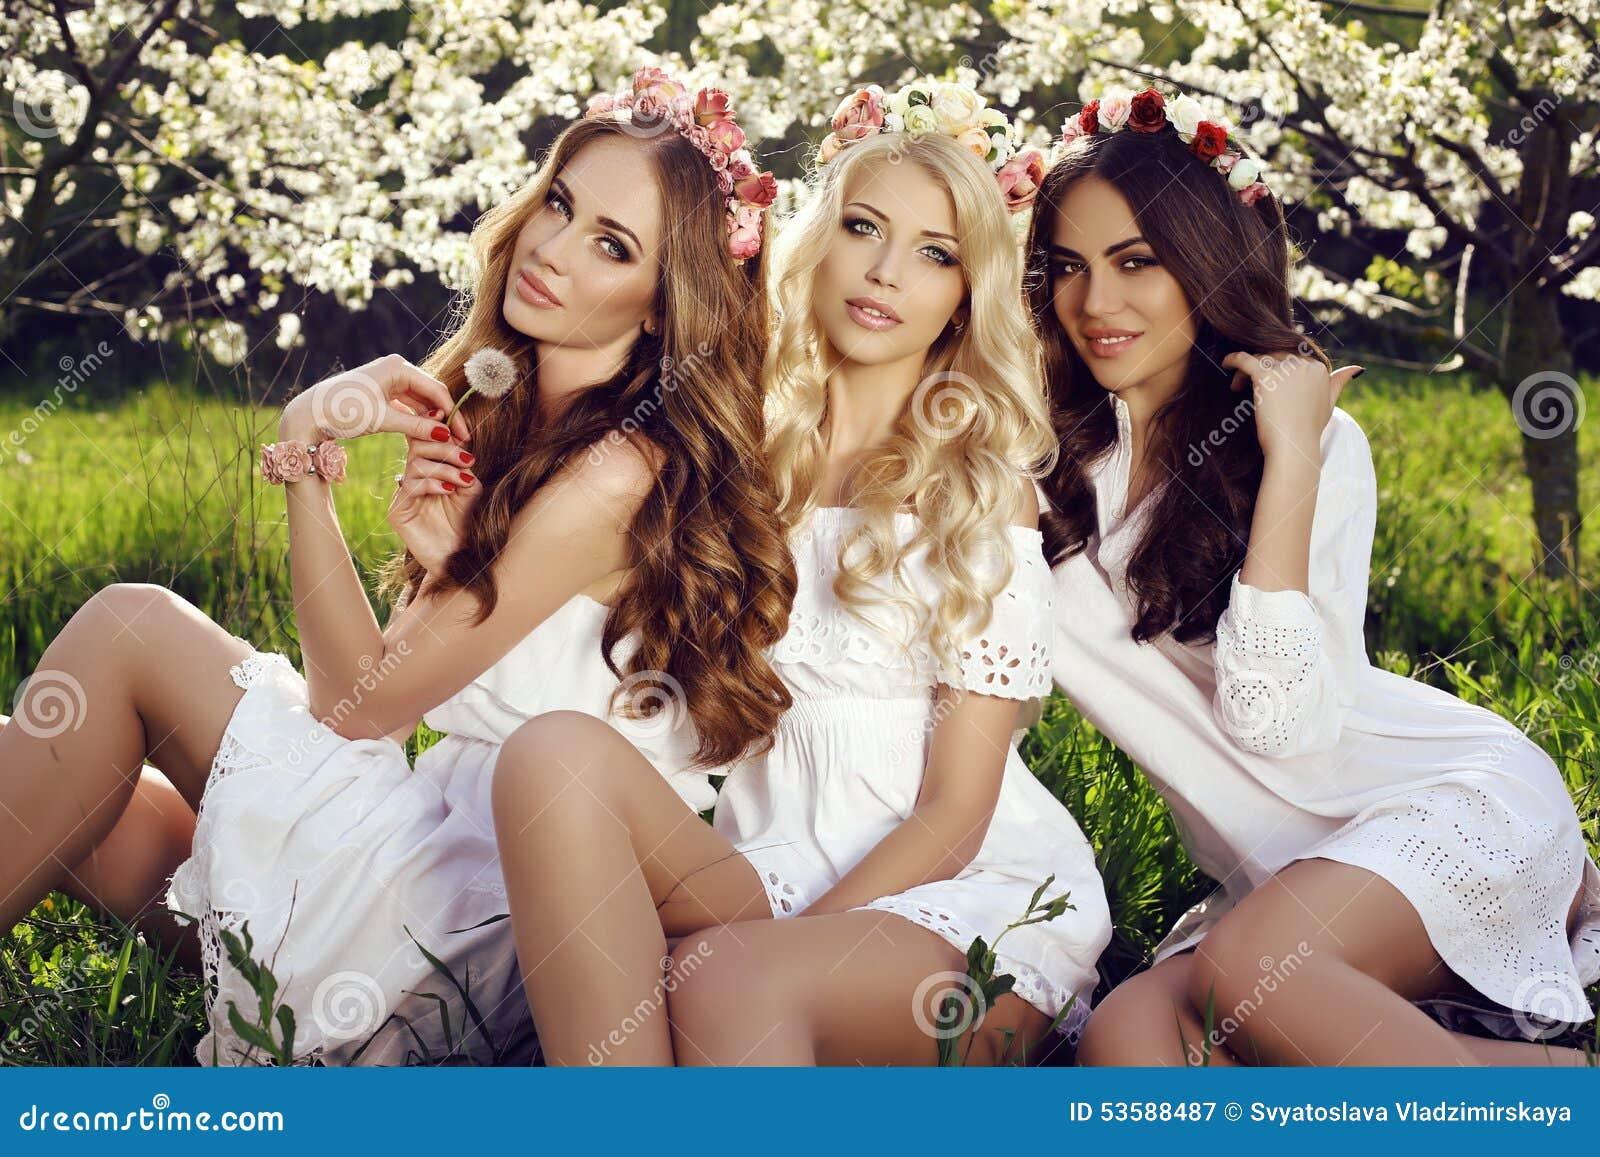 Charming Girls In Elegant Dresses And Flower's Headband ... - photo#29